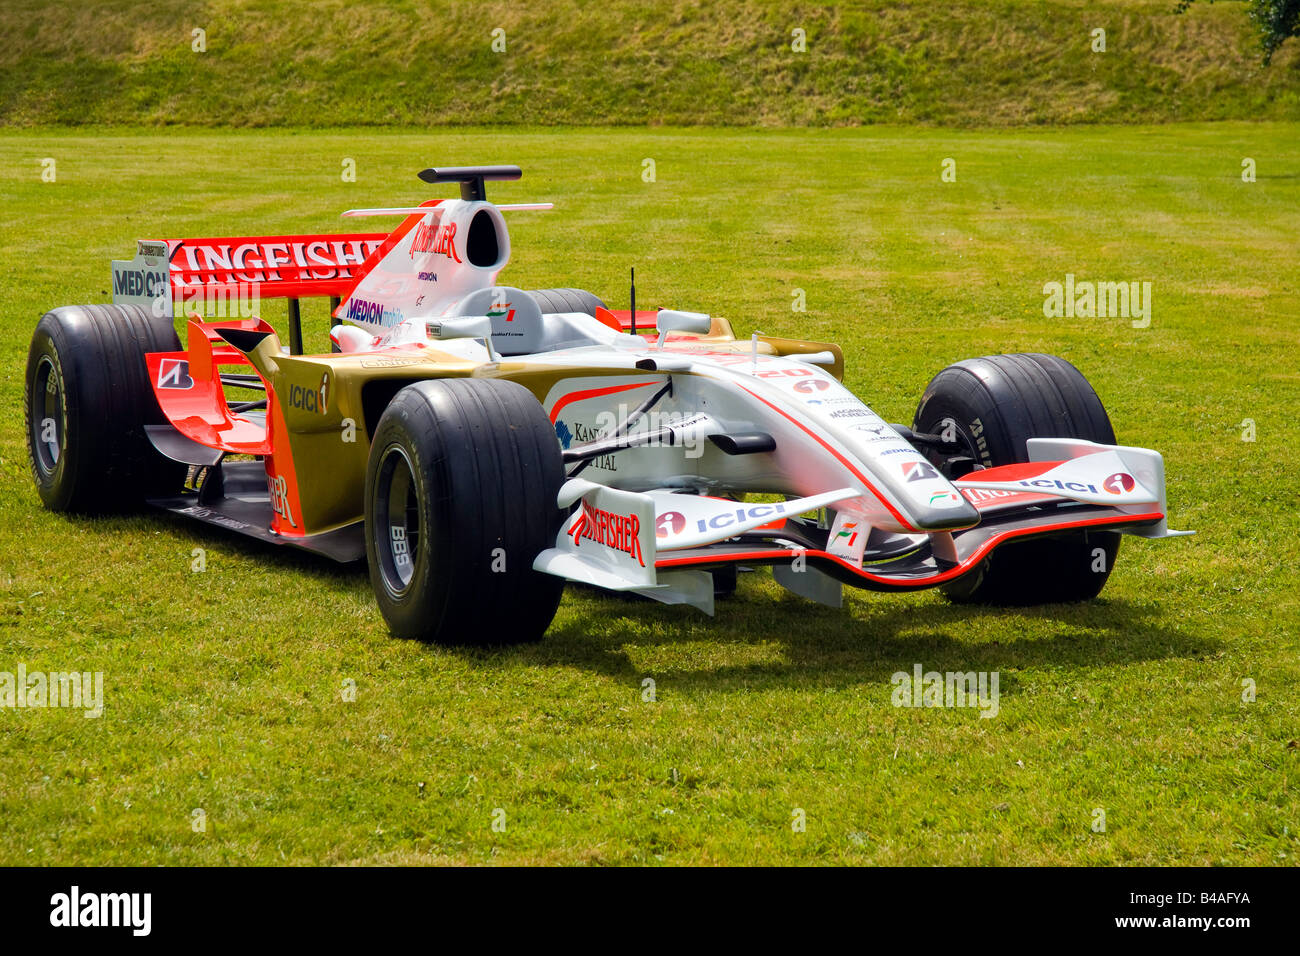 F1 Formula One motor sport Kingfisher Force India Photo Stock